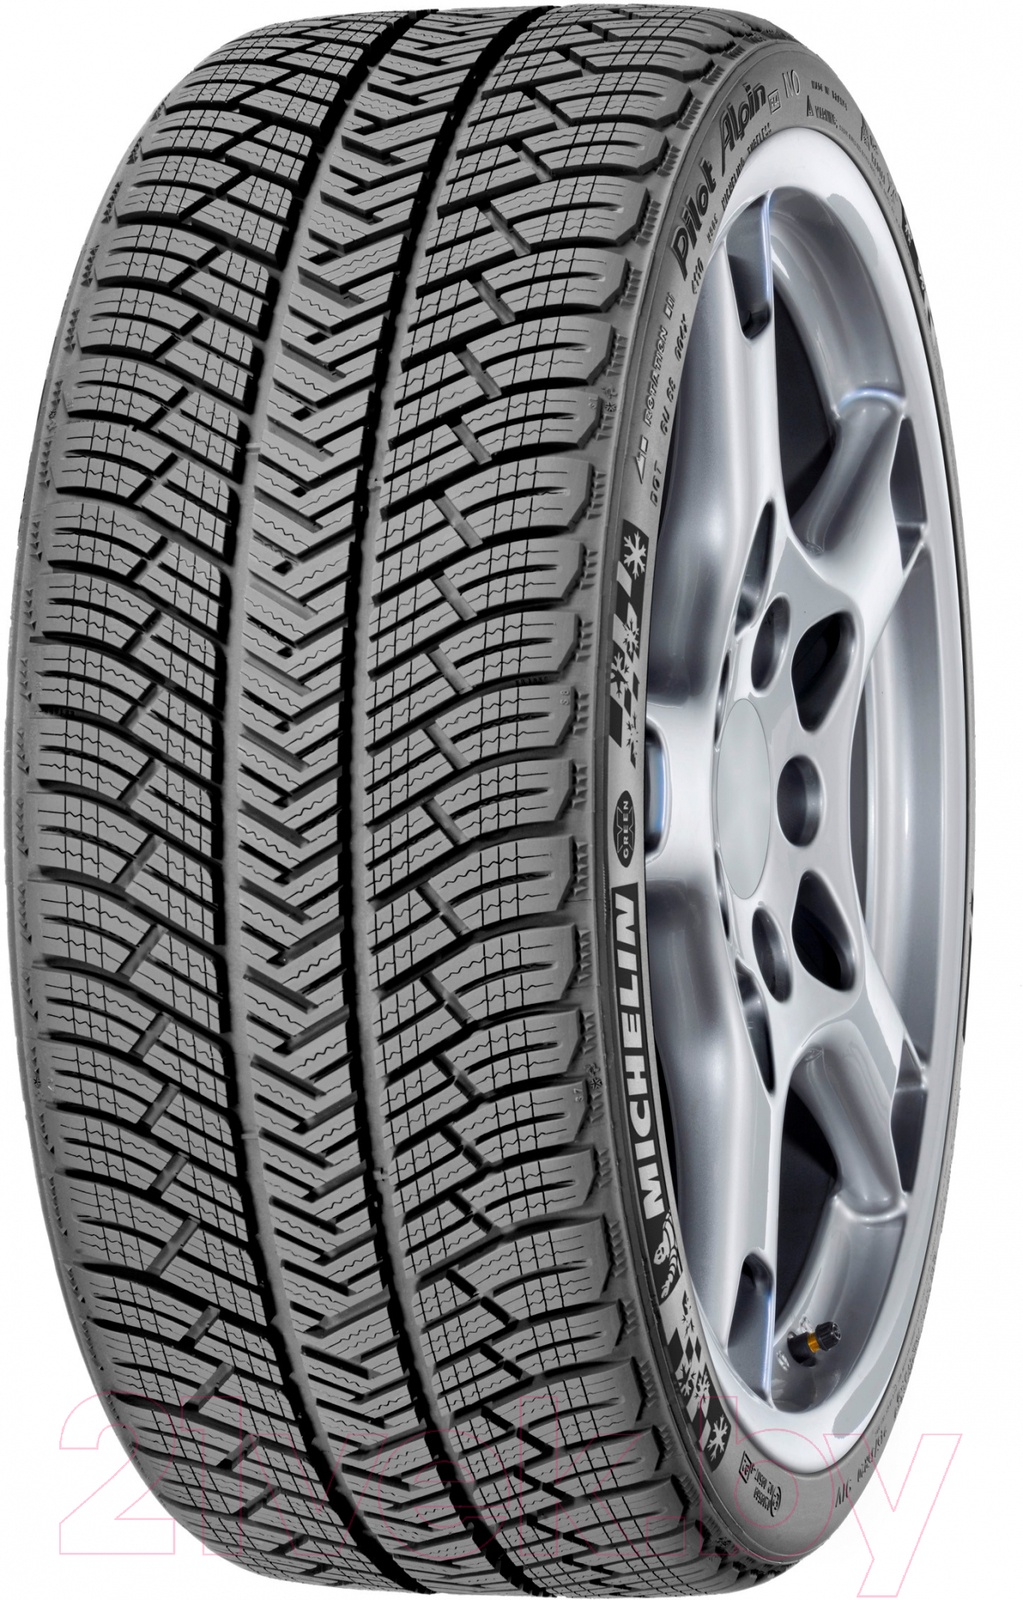 Автомобильные шины 315/35R20 110V XL Michelin Pilot Alpin PA4 N0